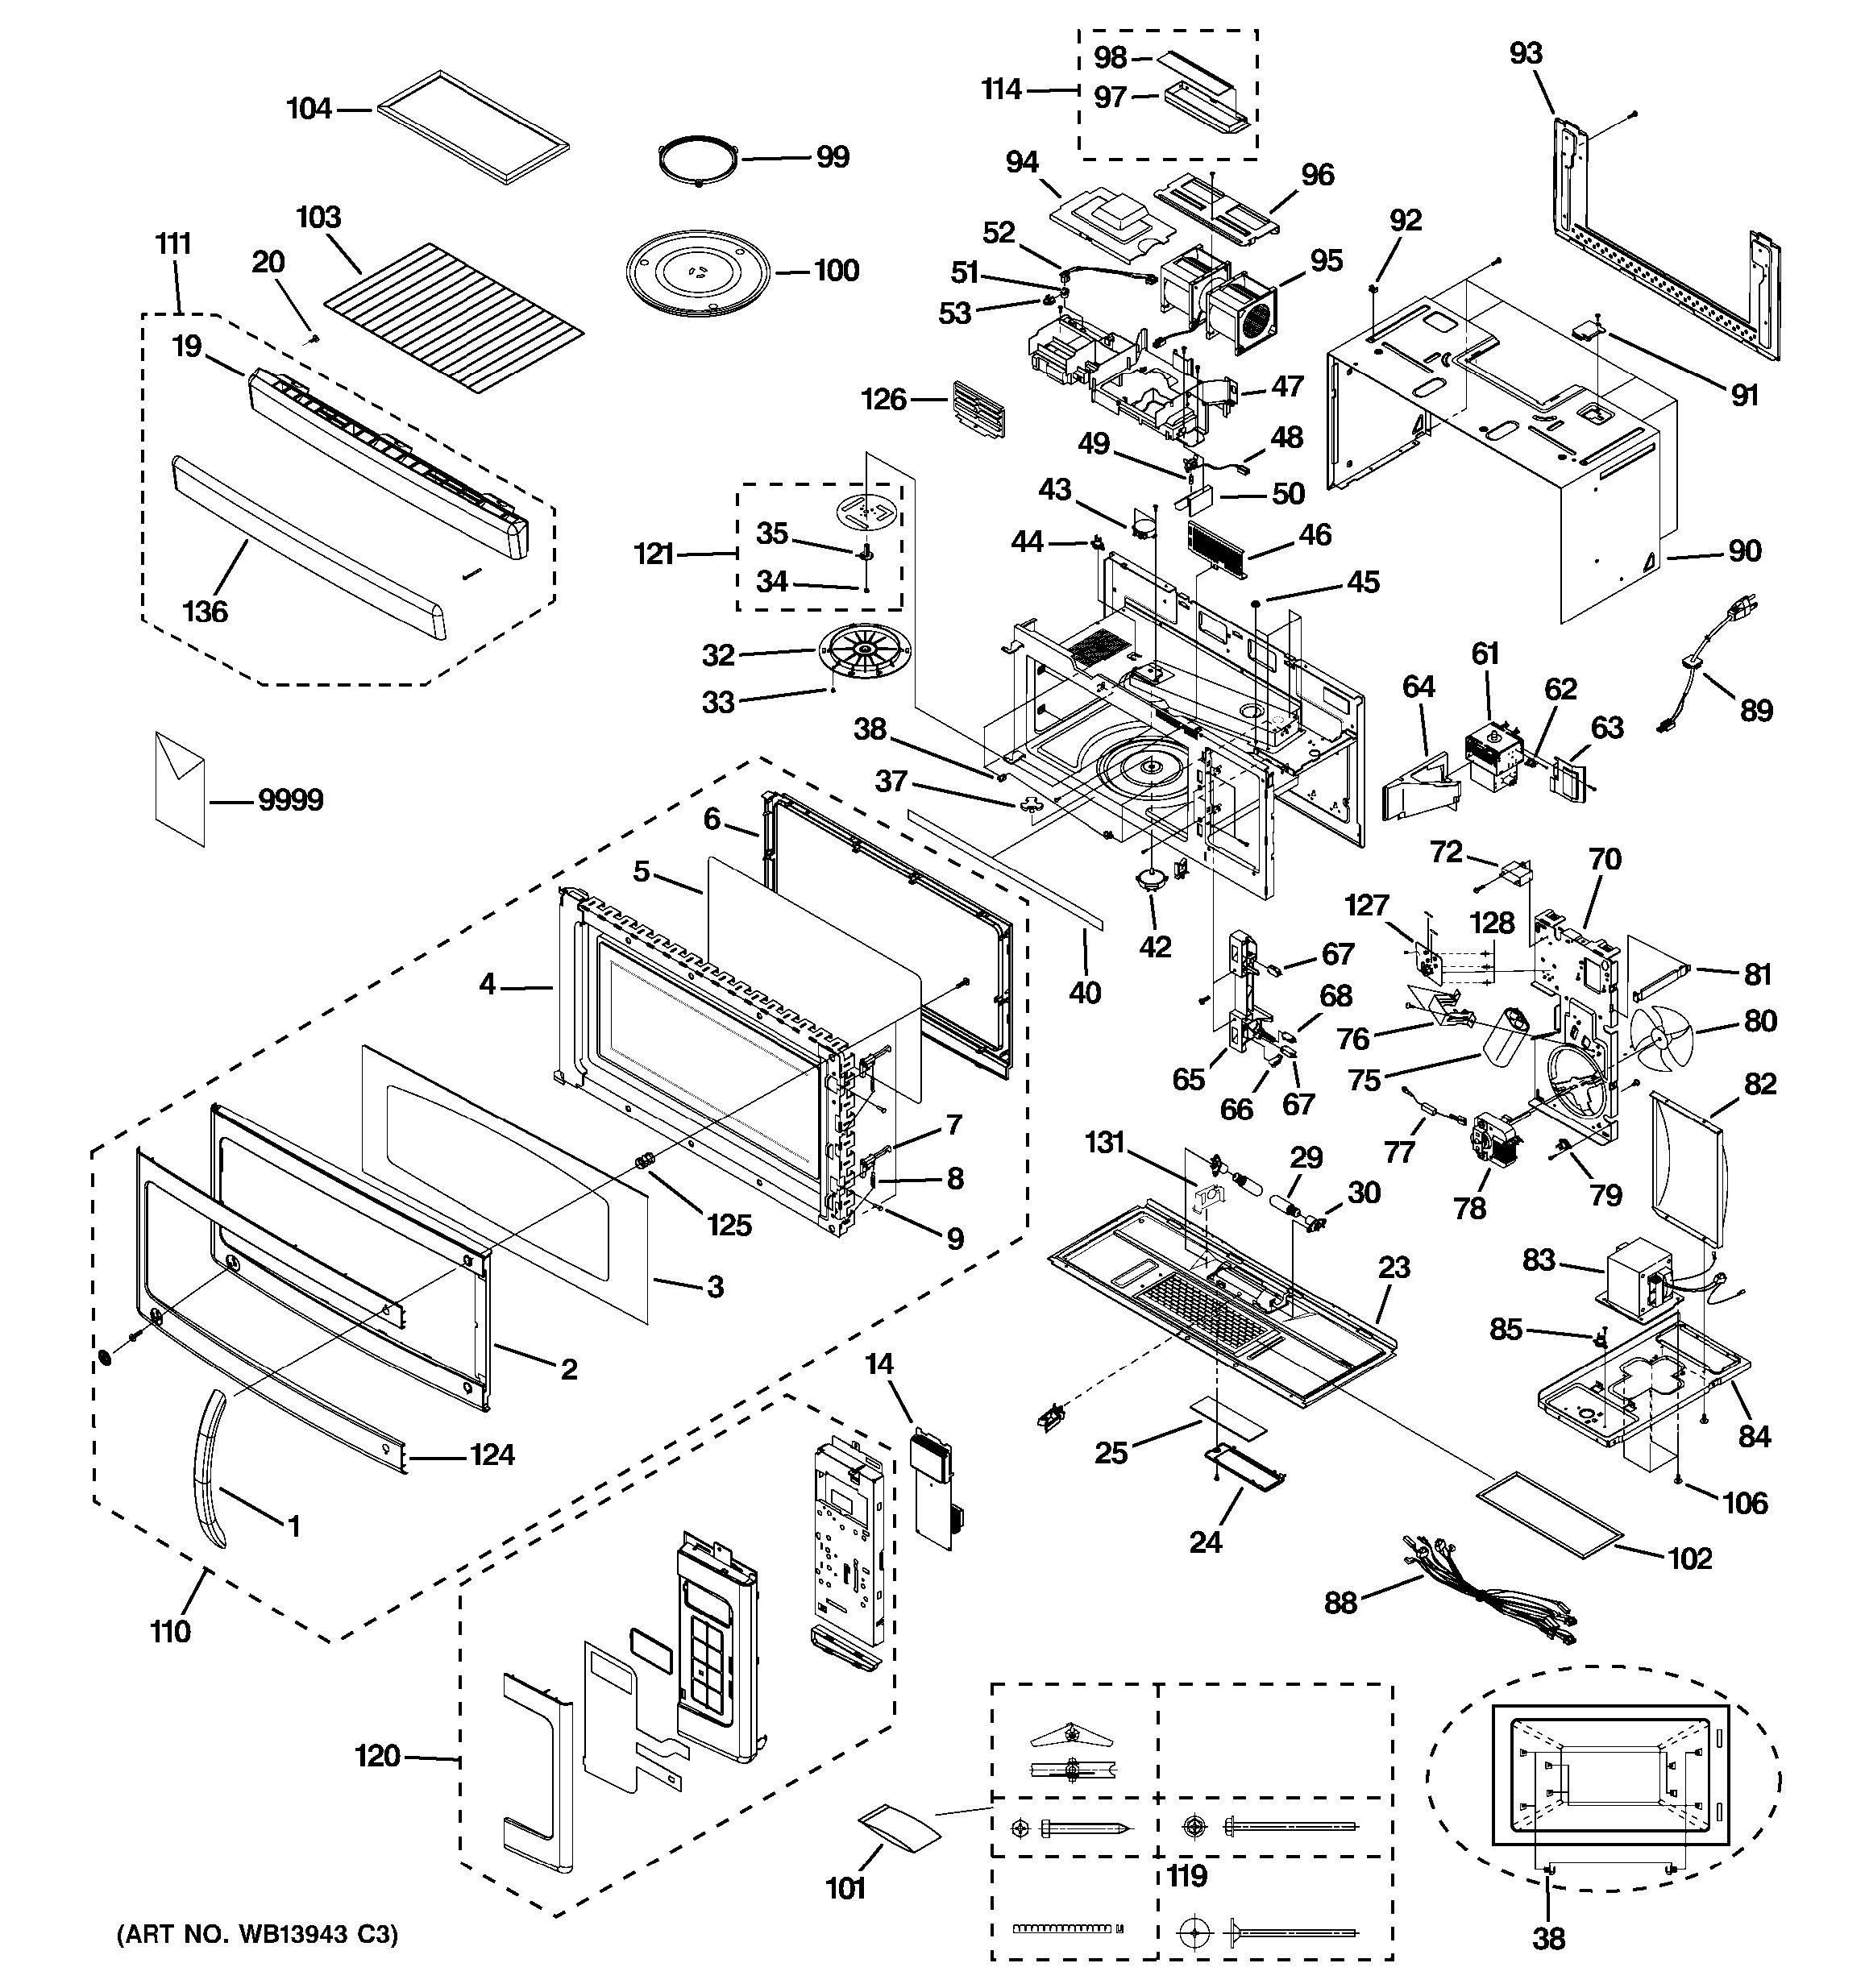 jkp27w ge oven wiring diagram